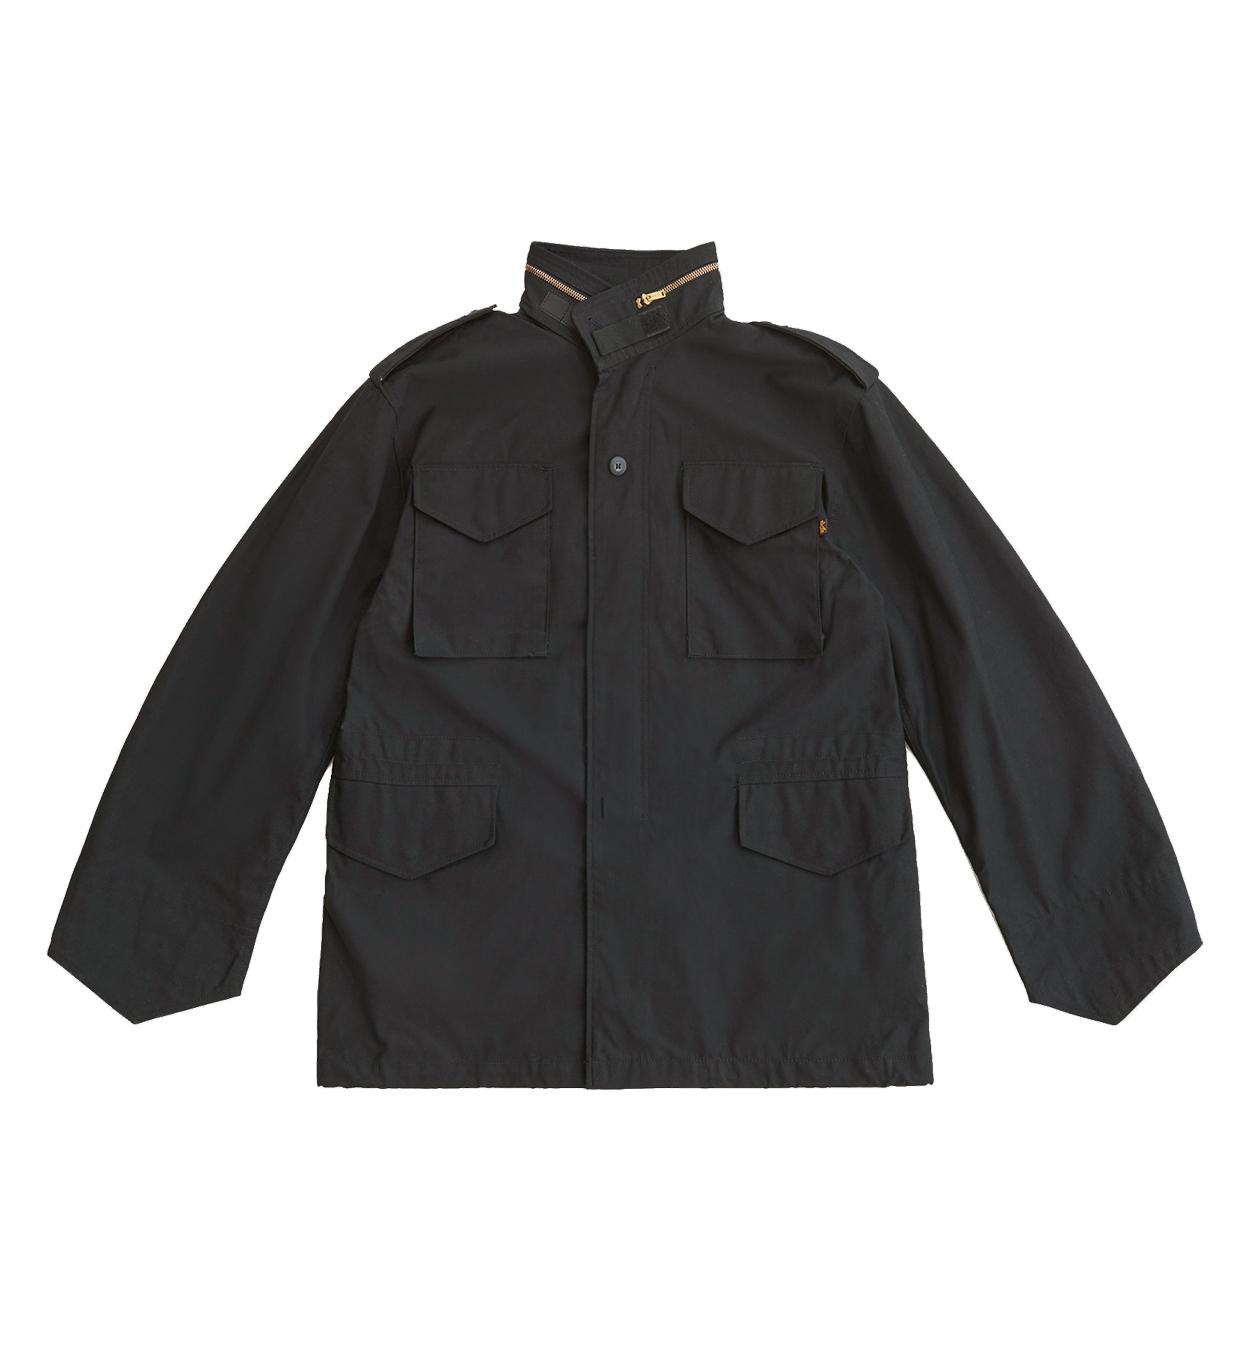 Куртка Alpha Industries M-65 Black (черная)